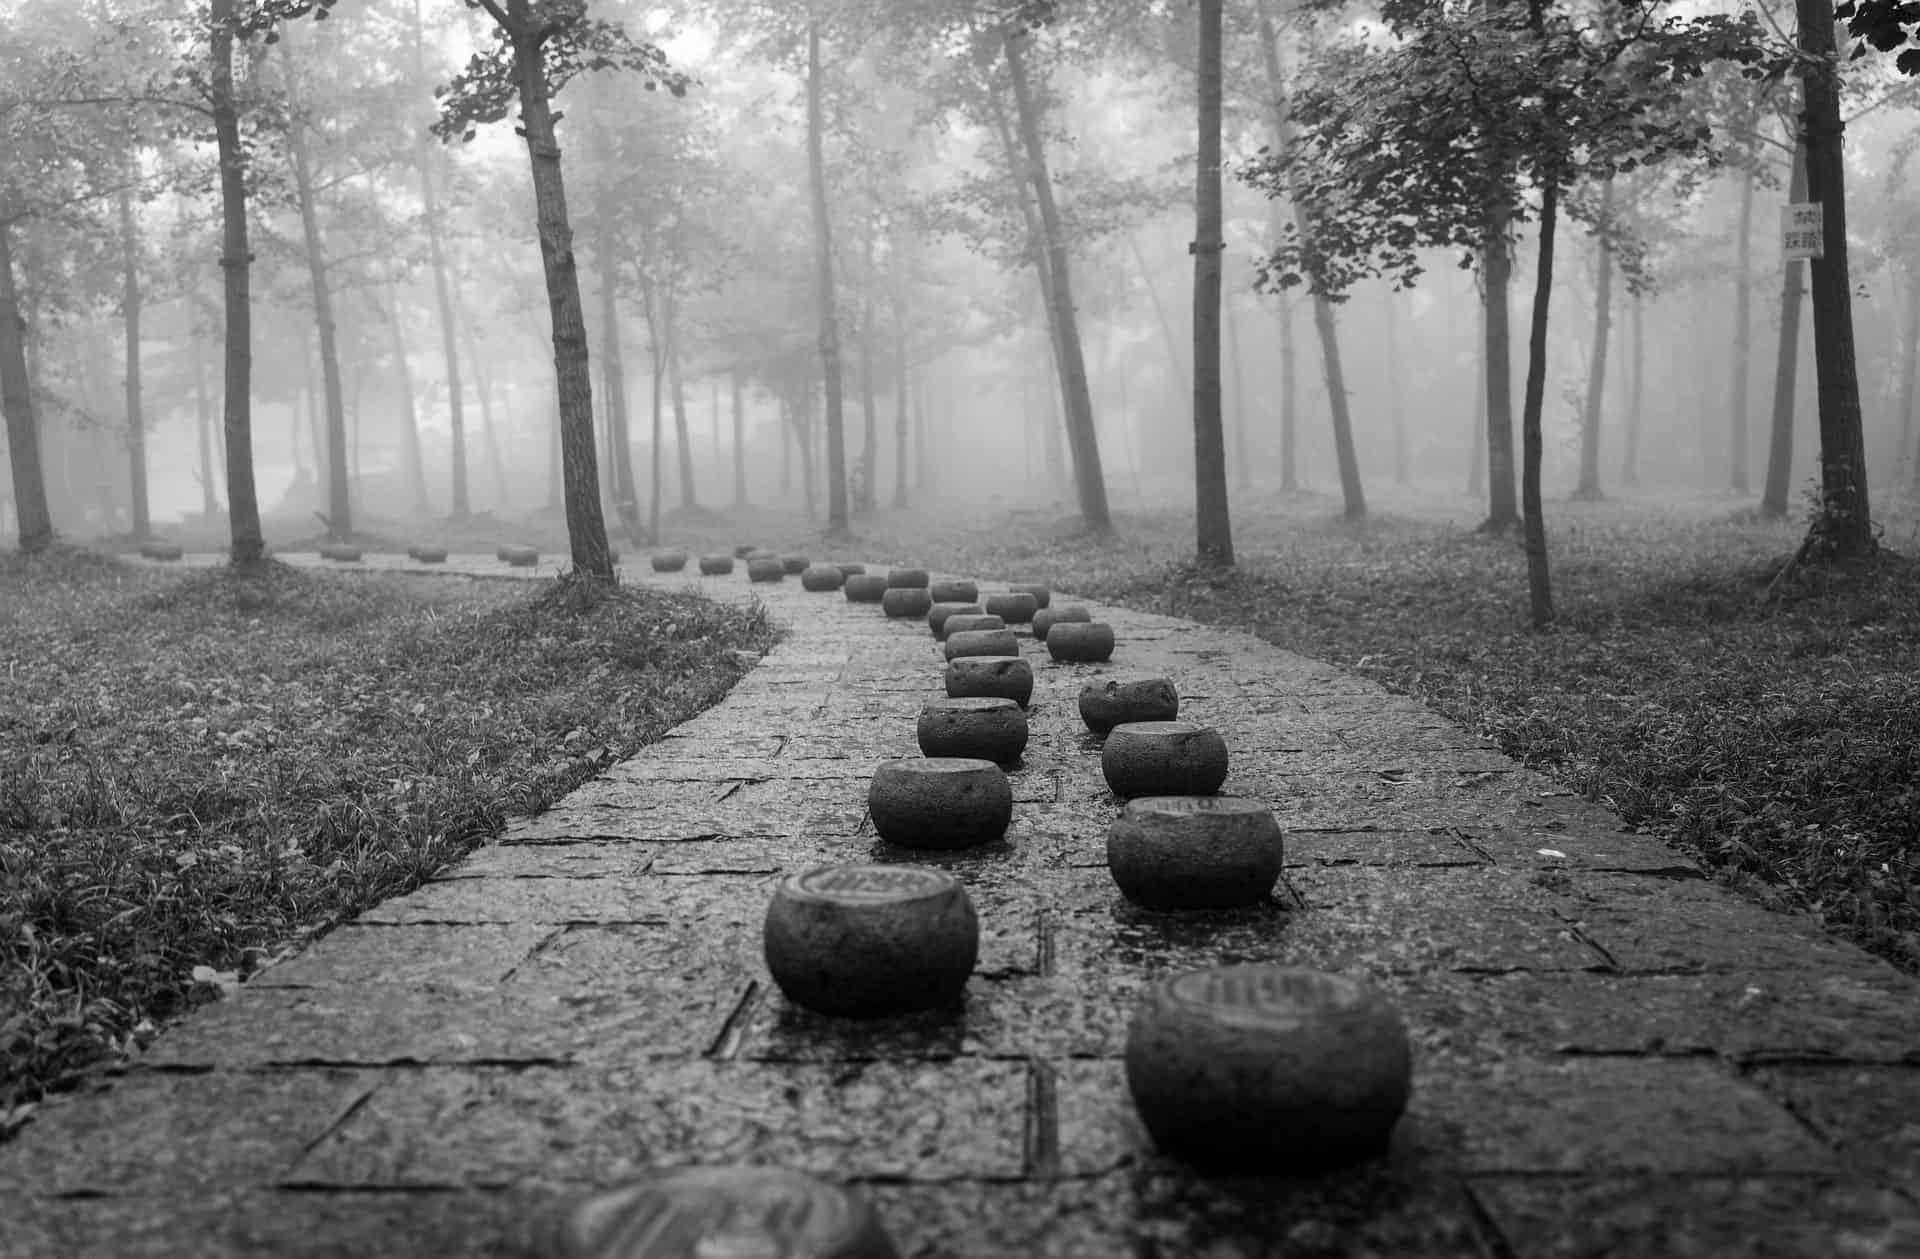 stone path step nine of the twelve step programme